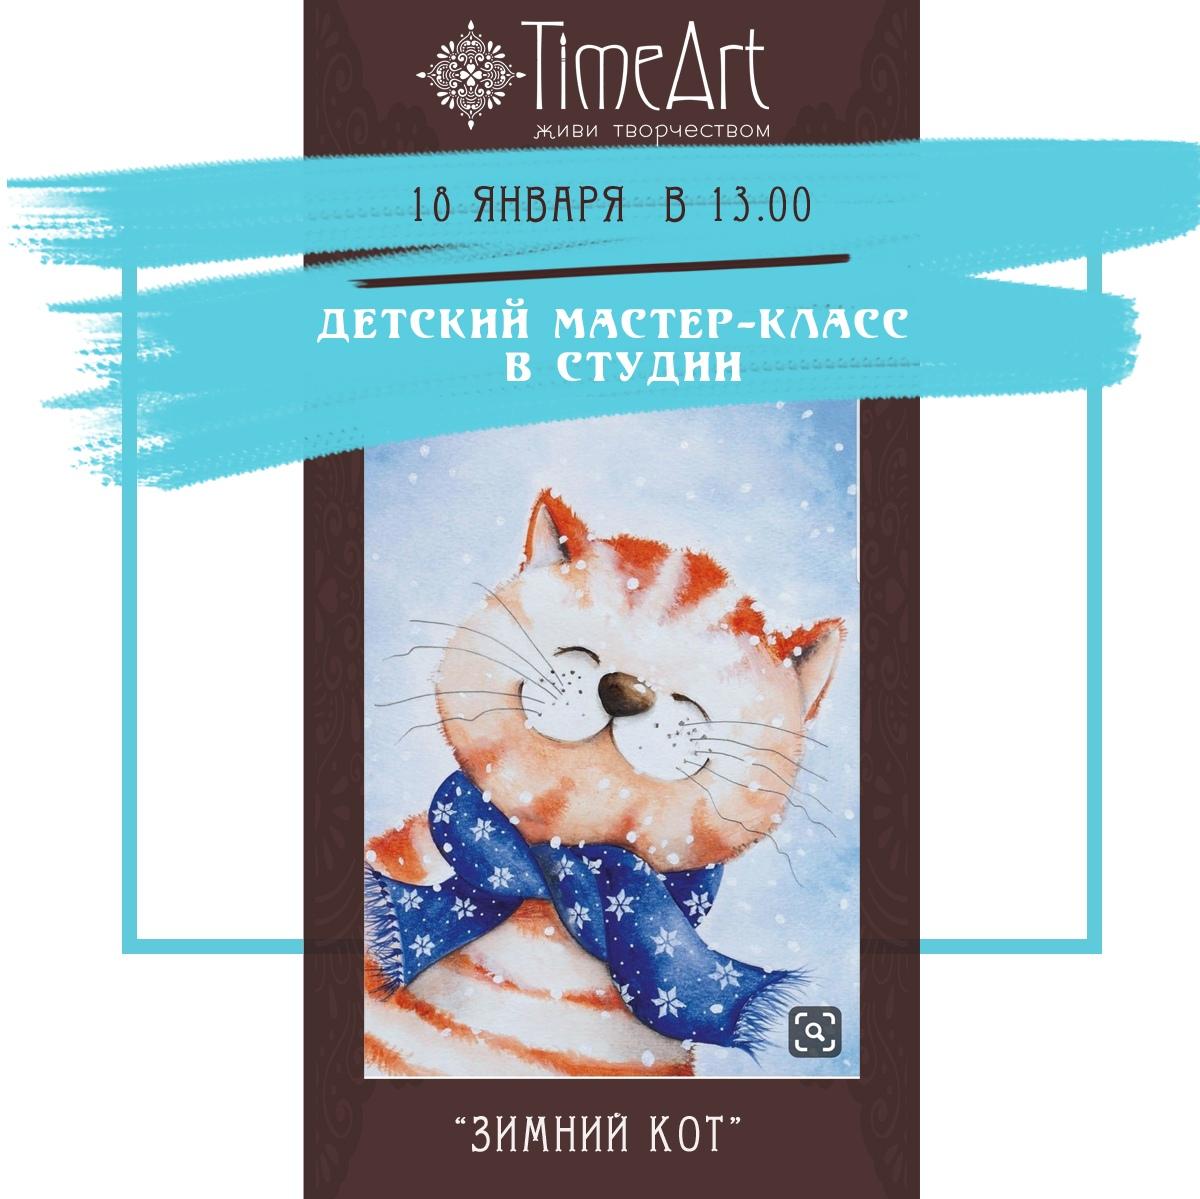 мероприятие Мастер-класс Зимний кот курган афиша расписание